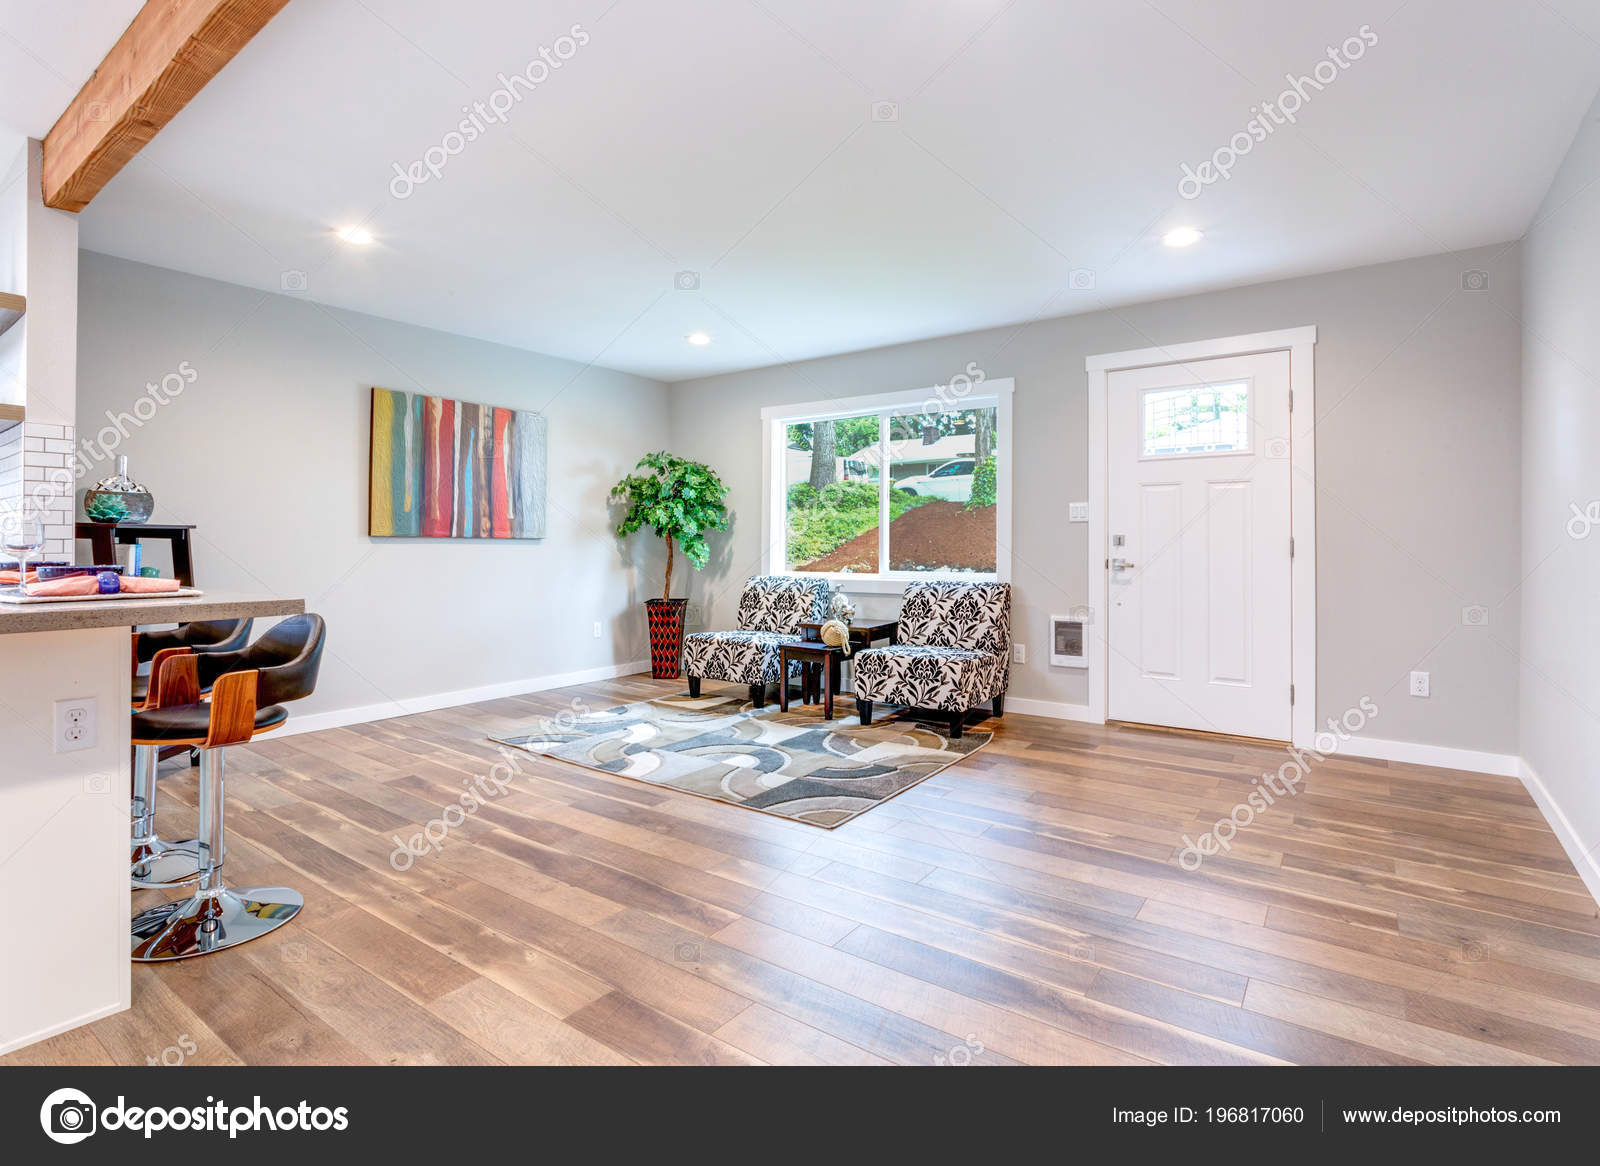 Interior Casa Concepto Abierto Con Piso Madera Monton Espacio